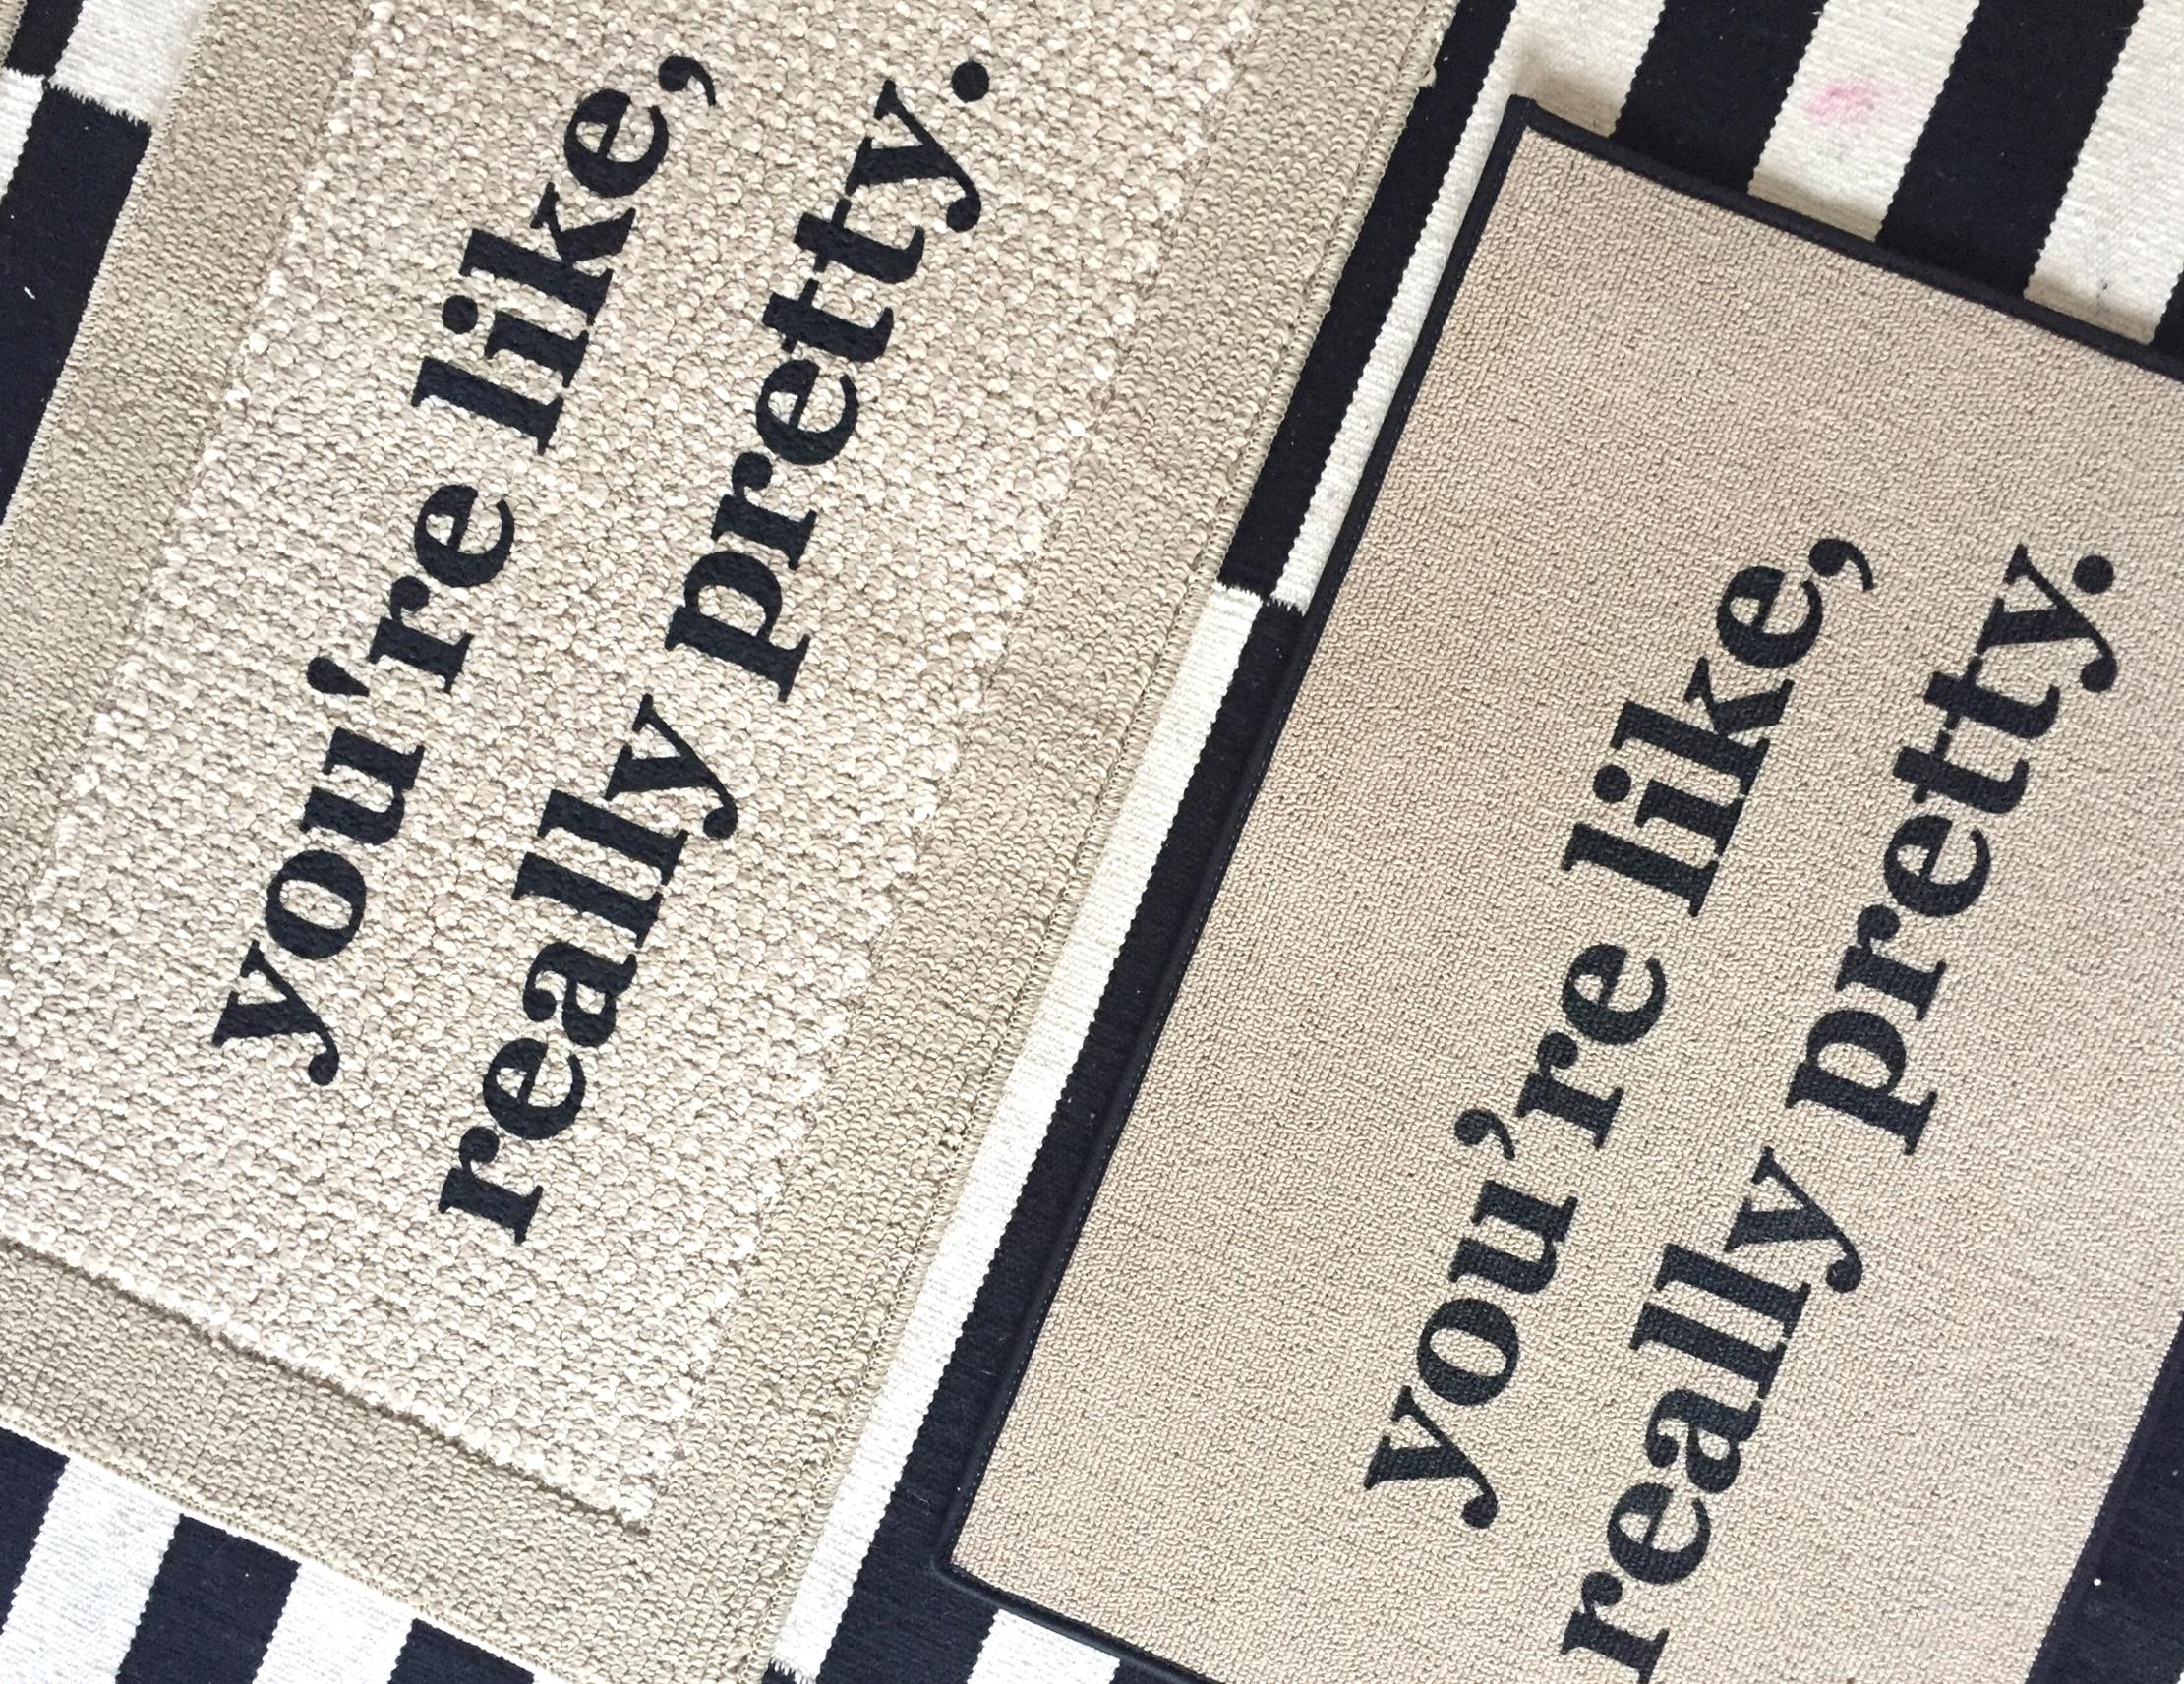 Hand painted mat (left)vs. screen printed mat (right)